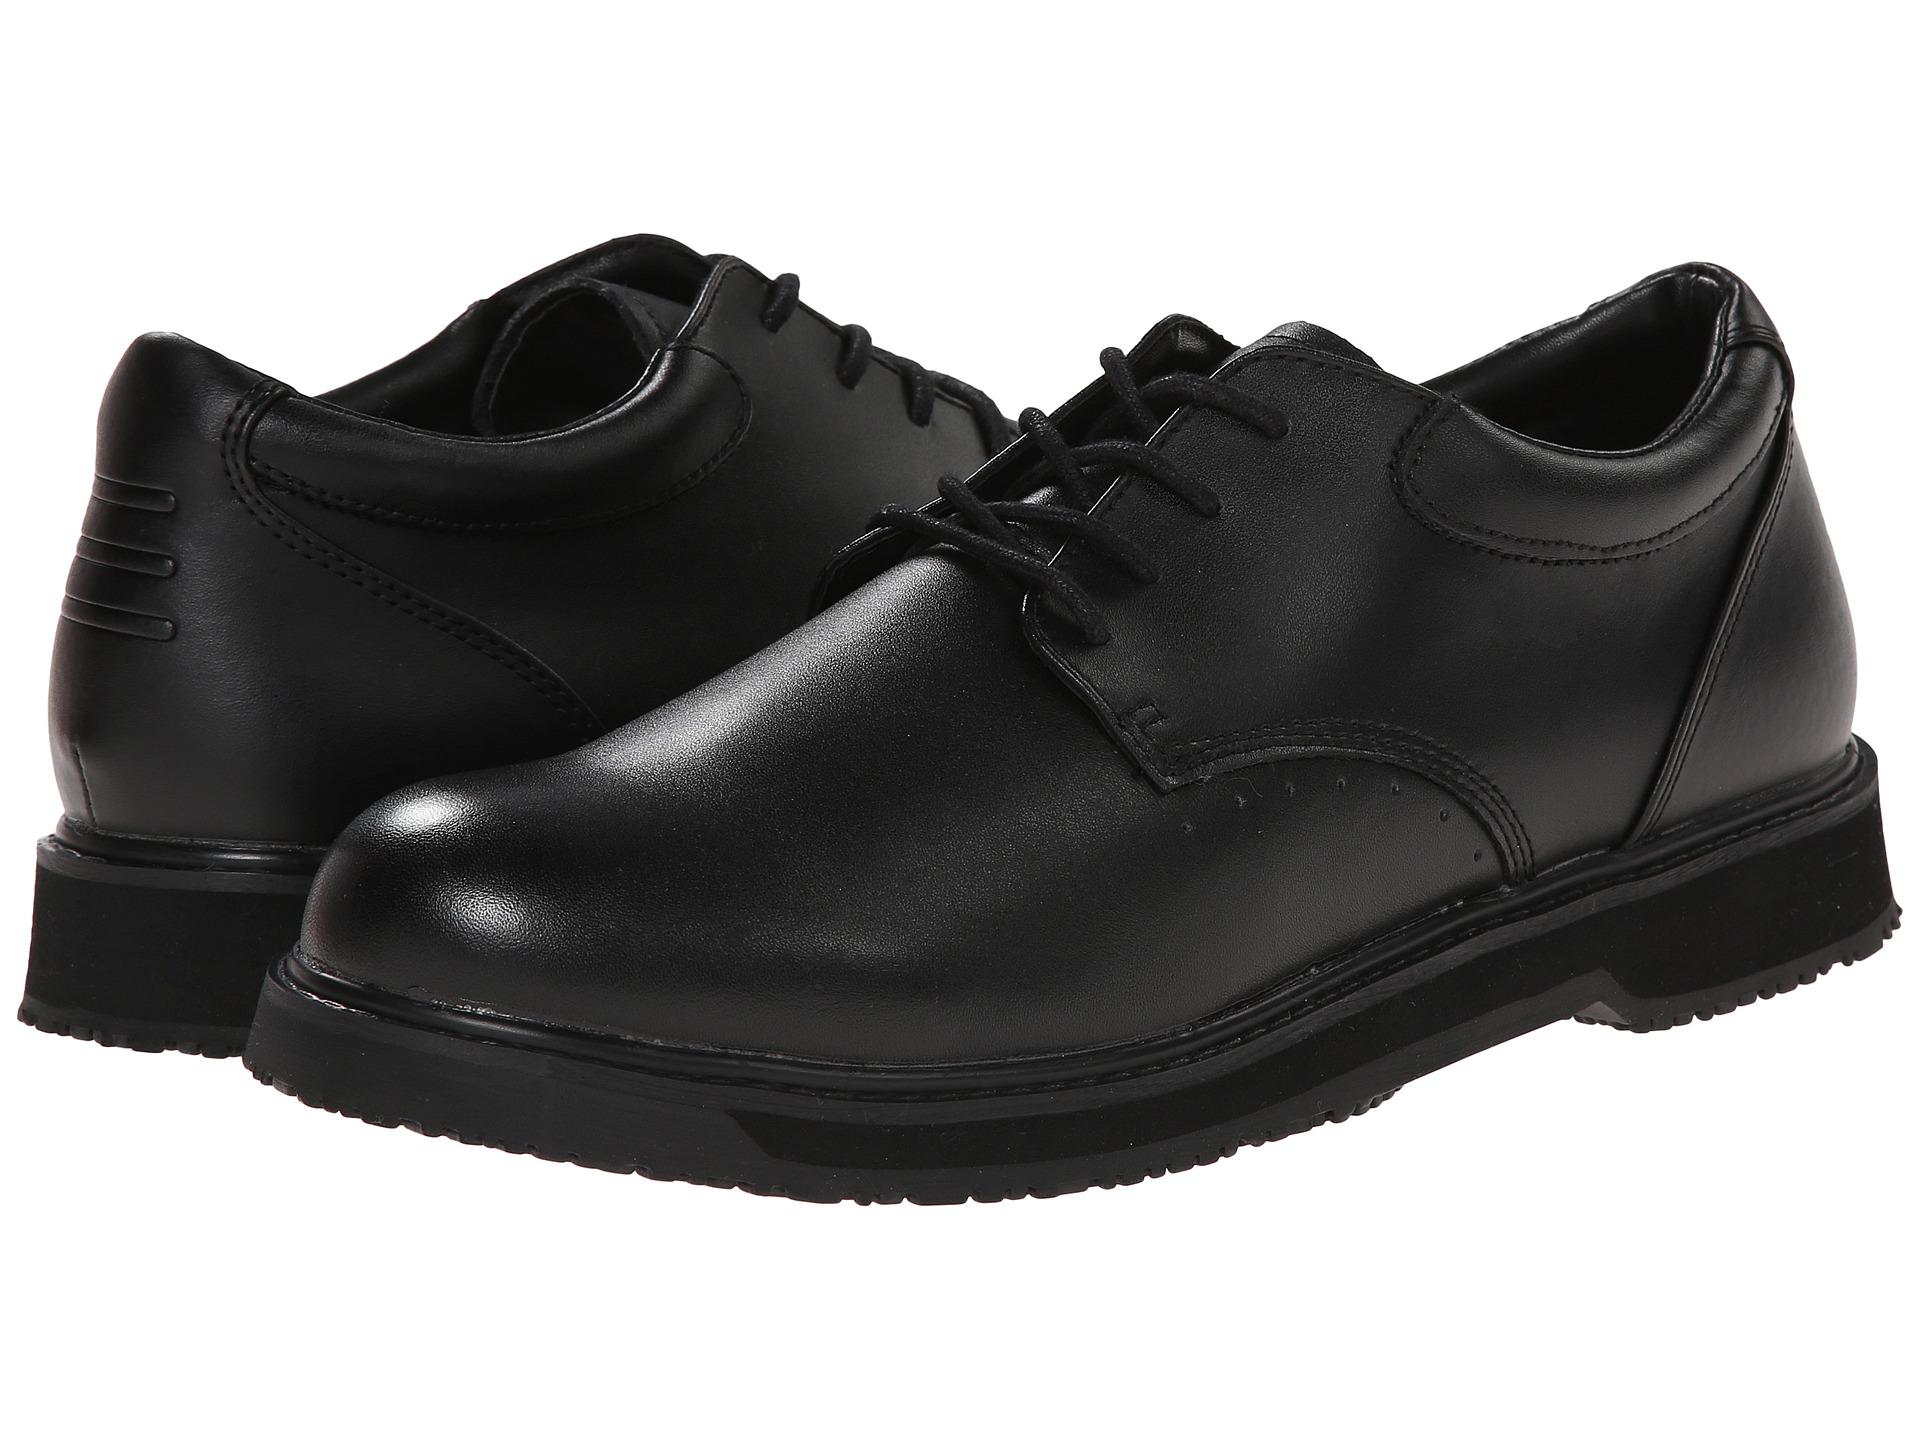 Propet Maxigrip Medicare/HCPCS Code = A5500 Diabetic Shoe ...